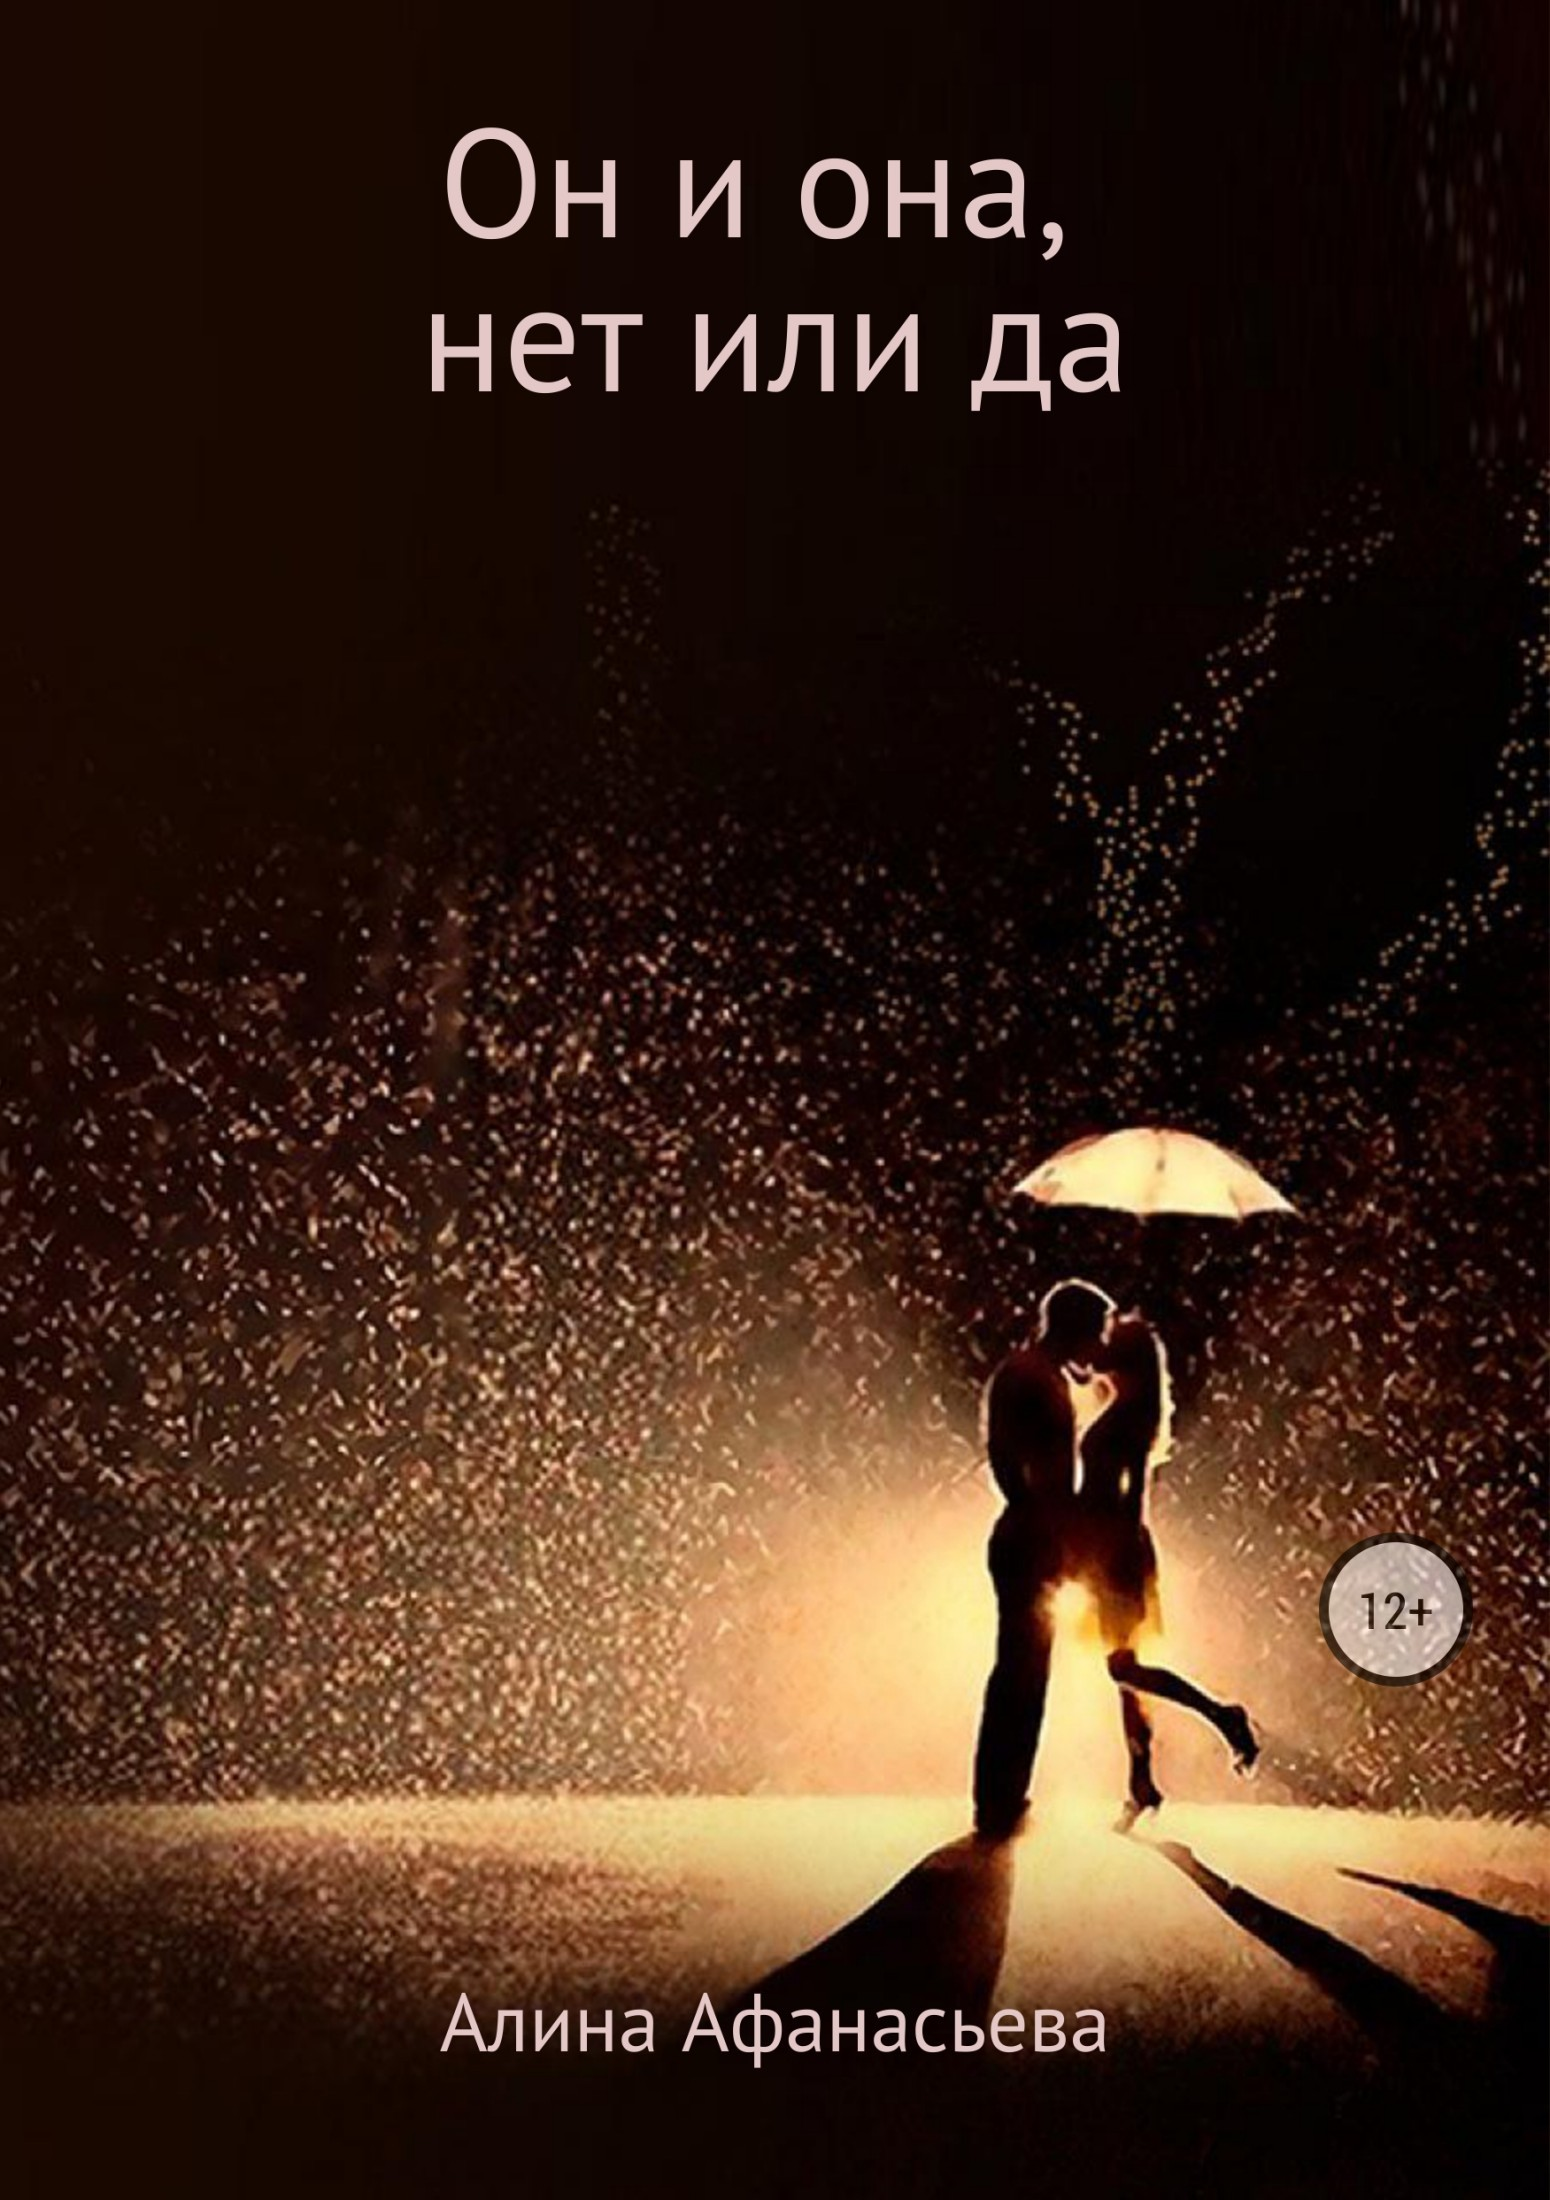 Алина Афанасьева Он и она, нет или да